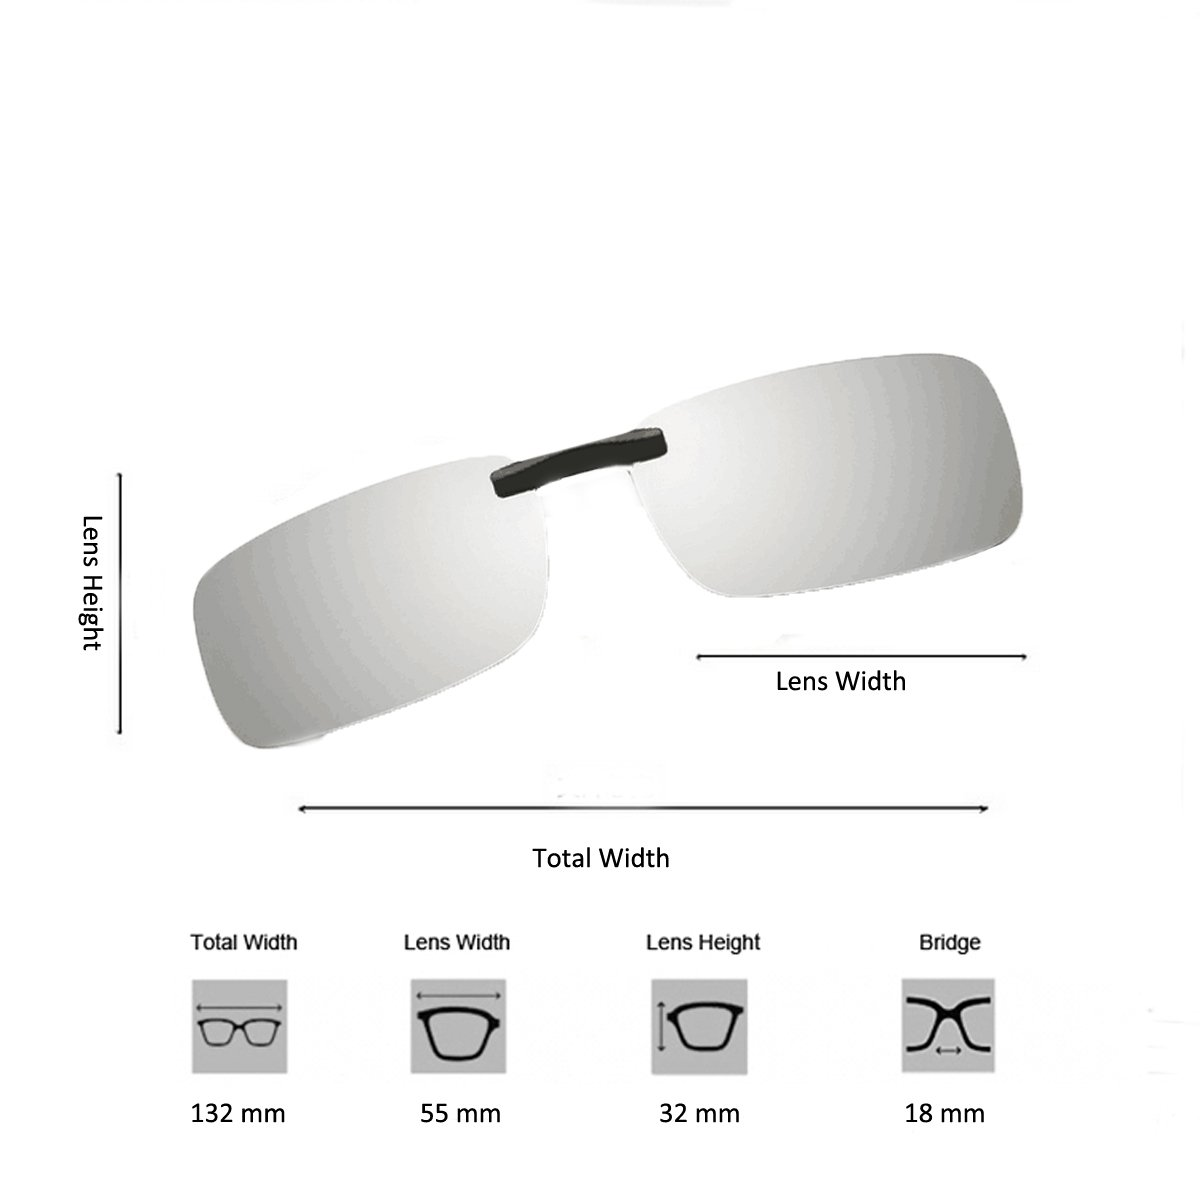 6d0cd7bc28e Clip On Sunglasses Men s Titanium Flexible Polarized Lenses Glasses Laura  Fairy 55) larger image